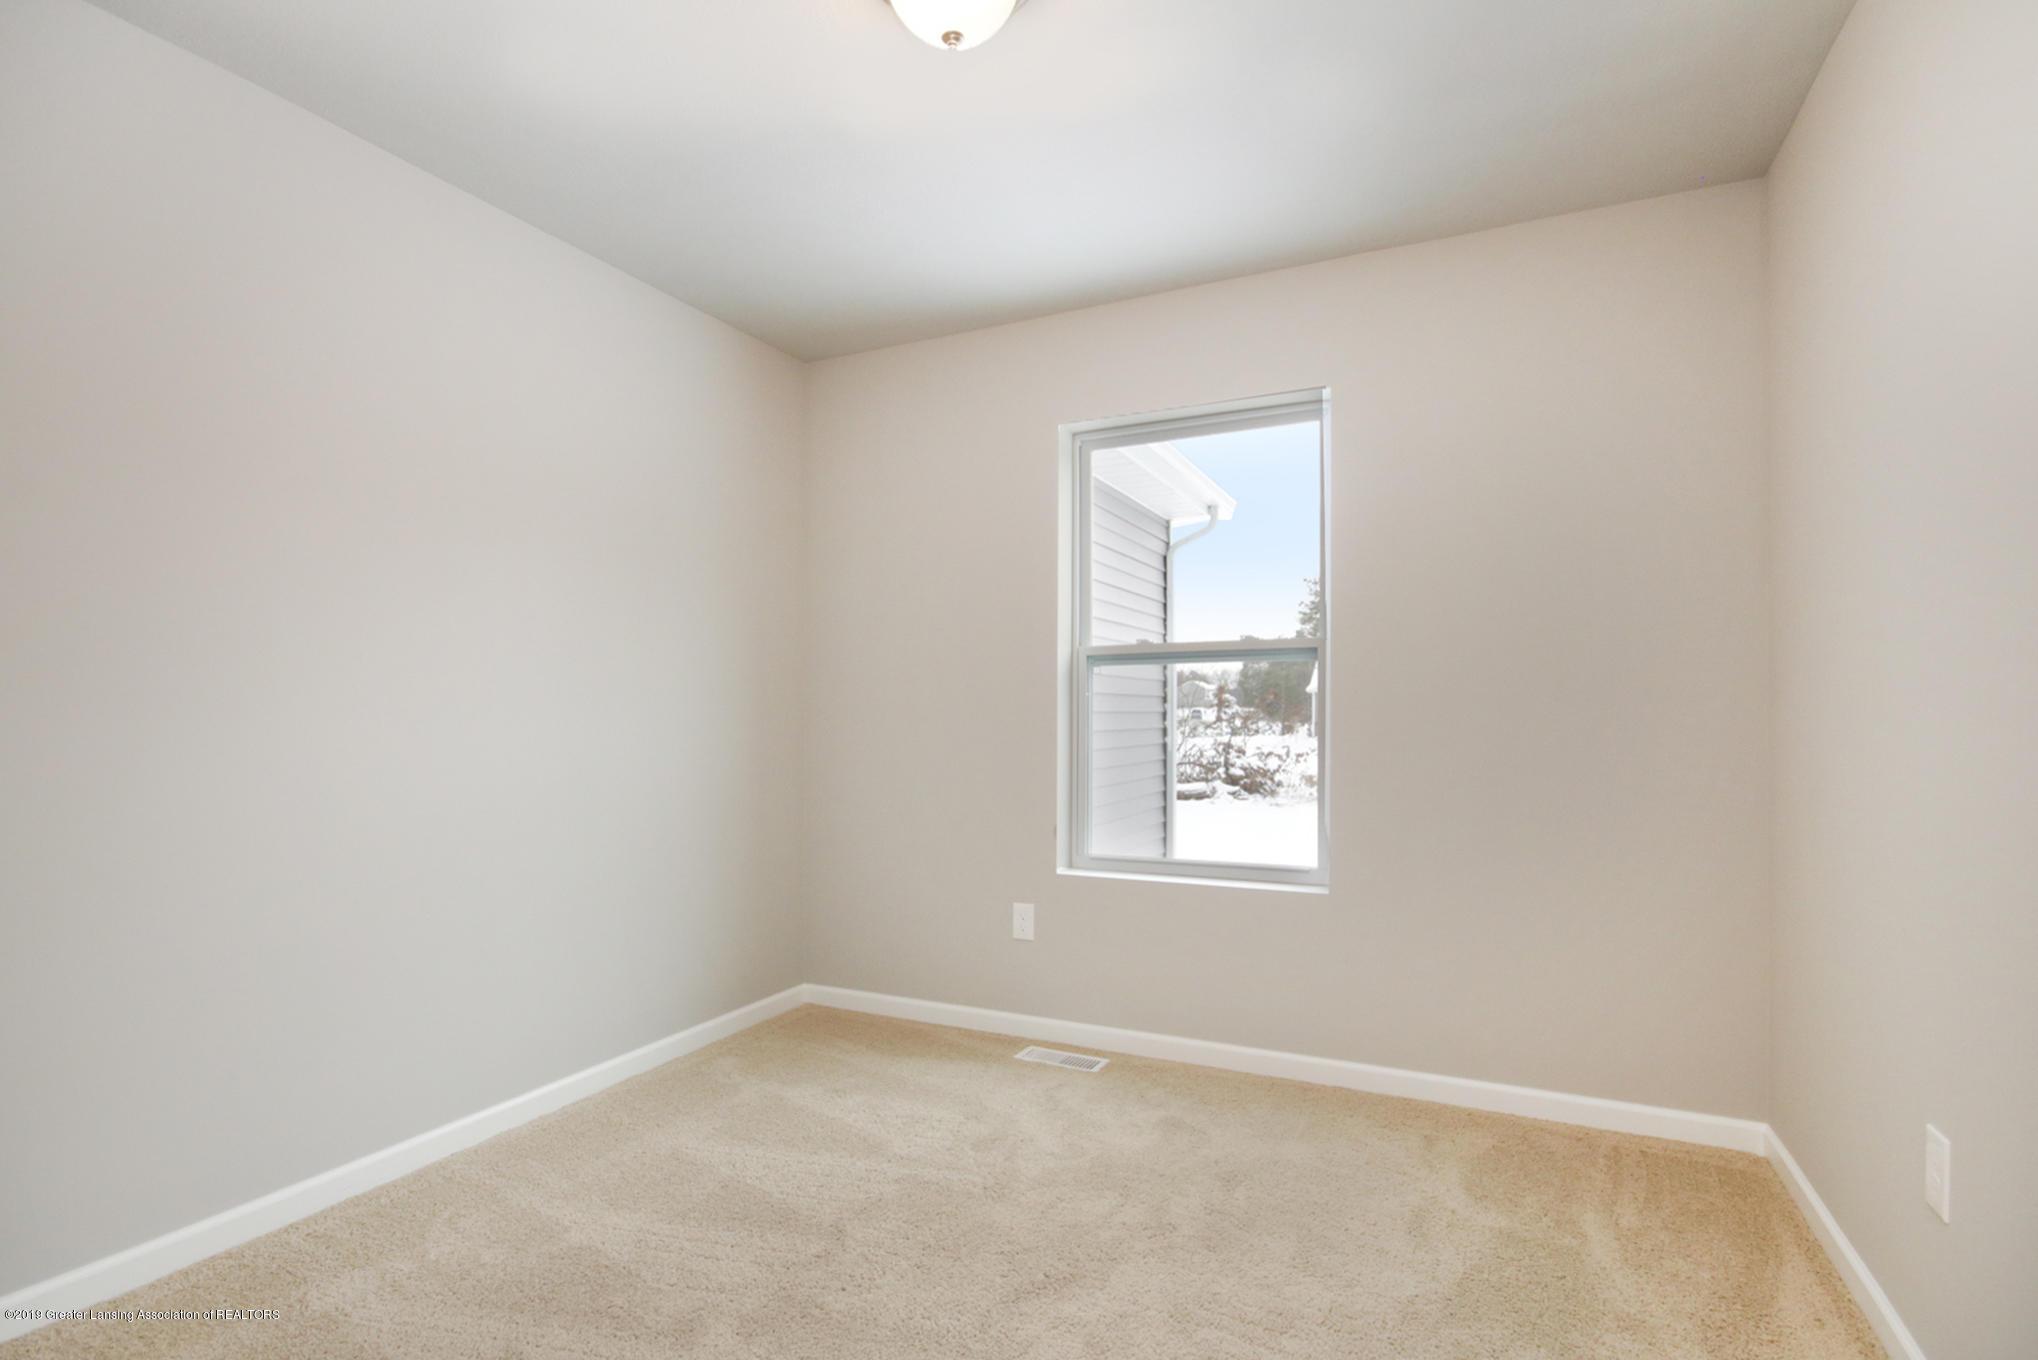 14171 Cordaleigh Dr - GSC035-E1600 Bedroom 2 - 13